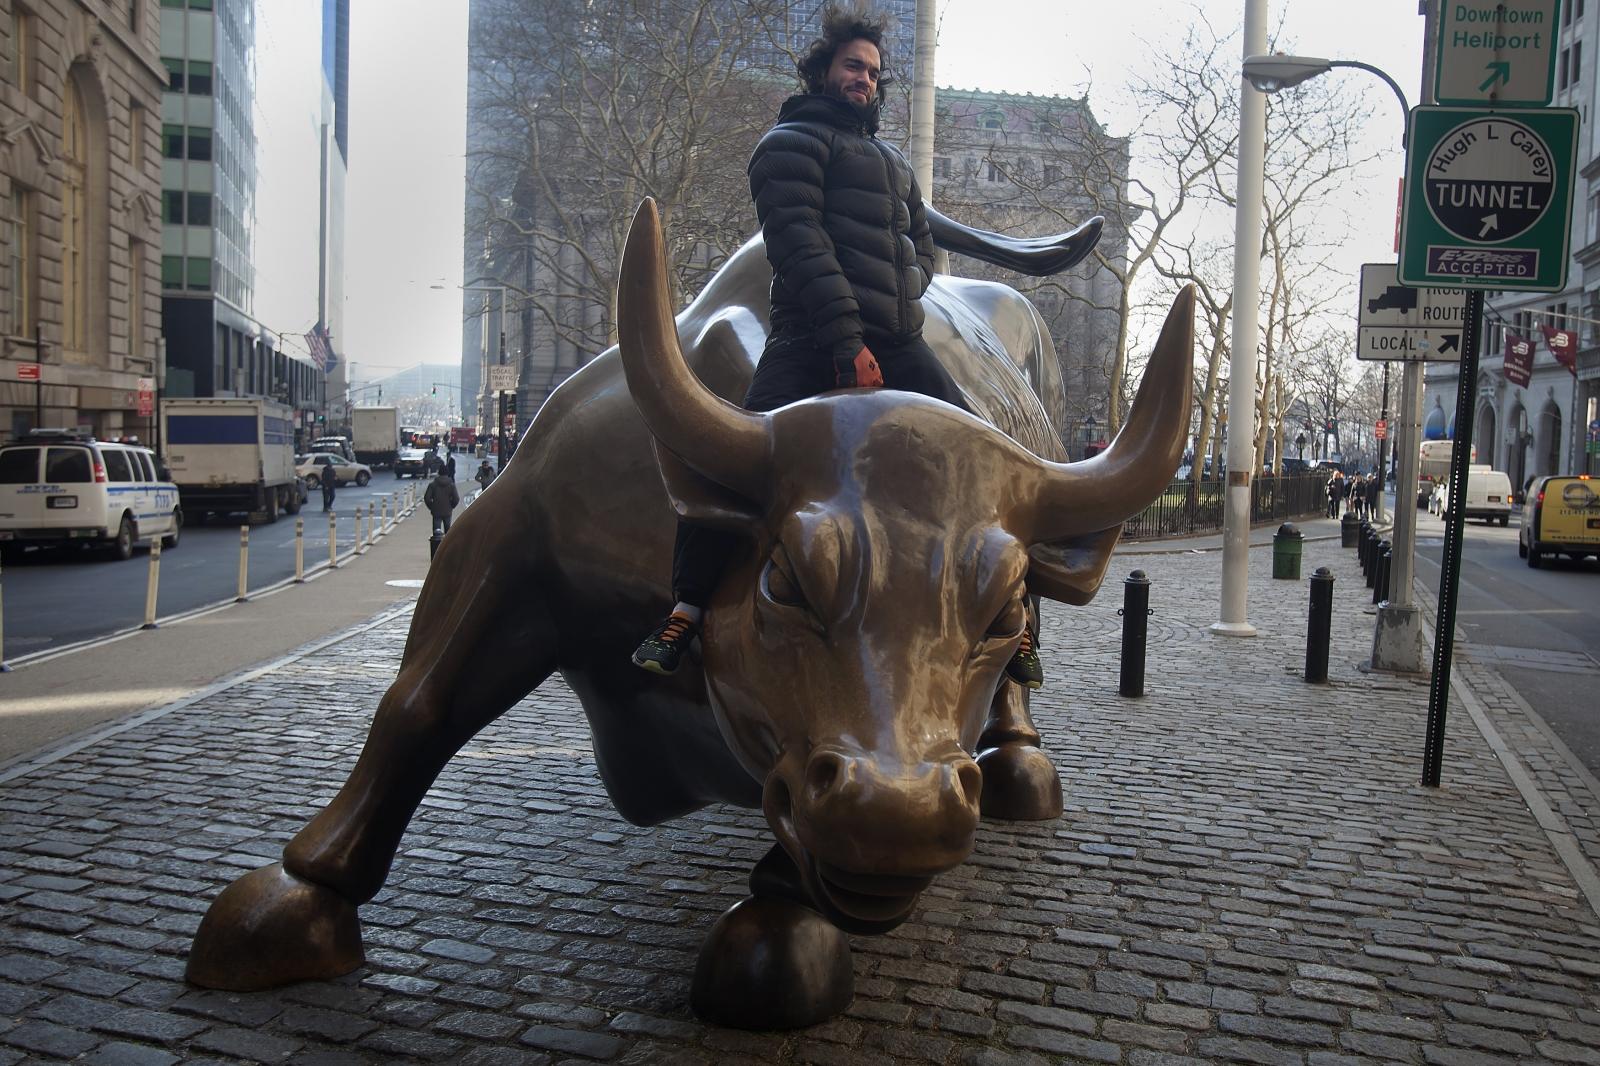 Wall Street's Charging Bull